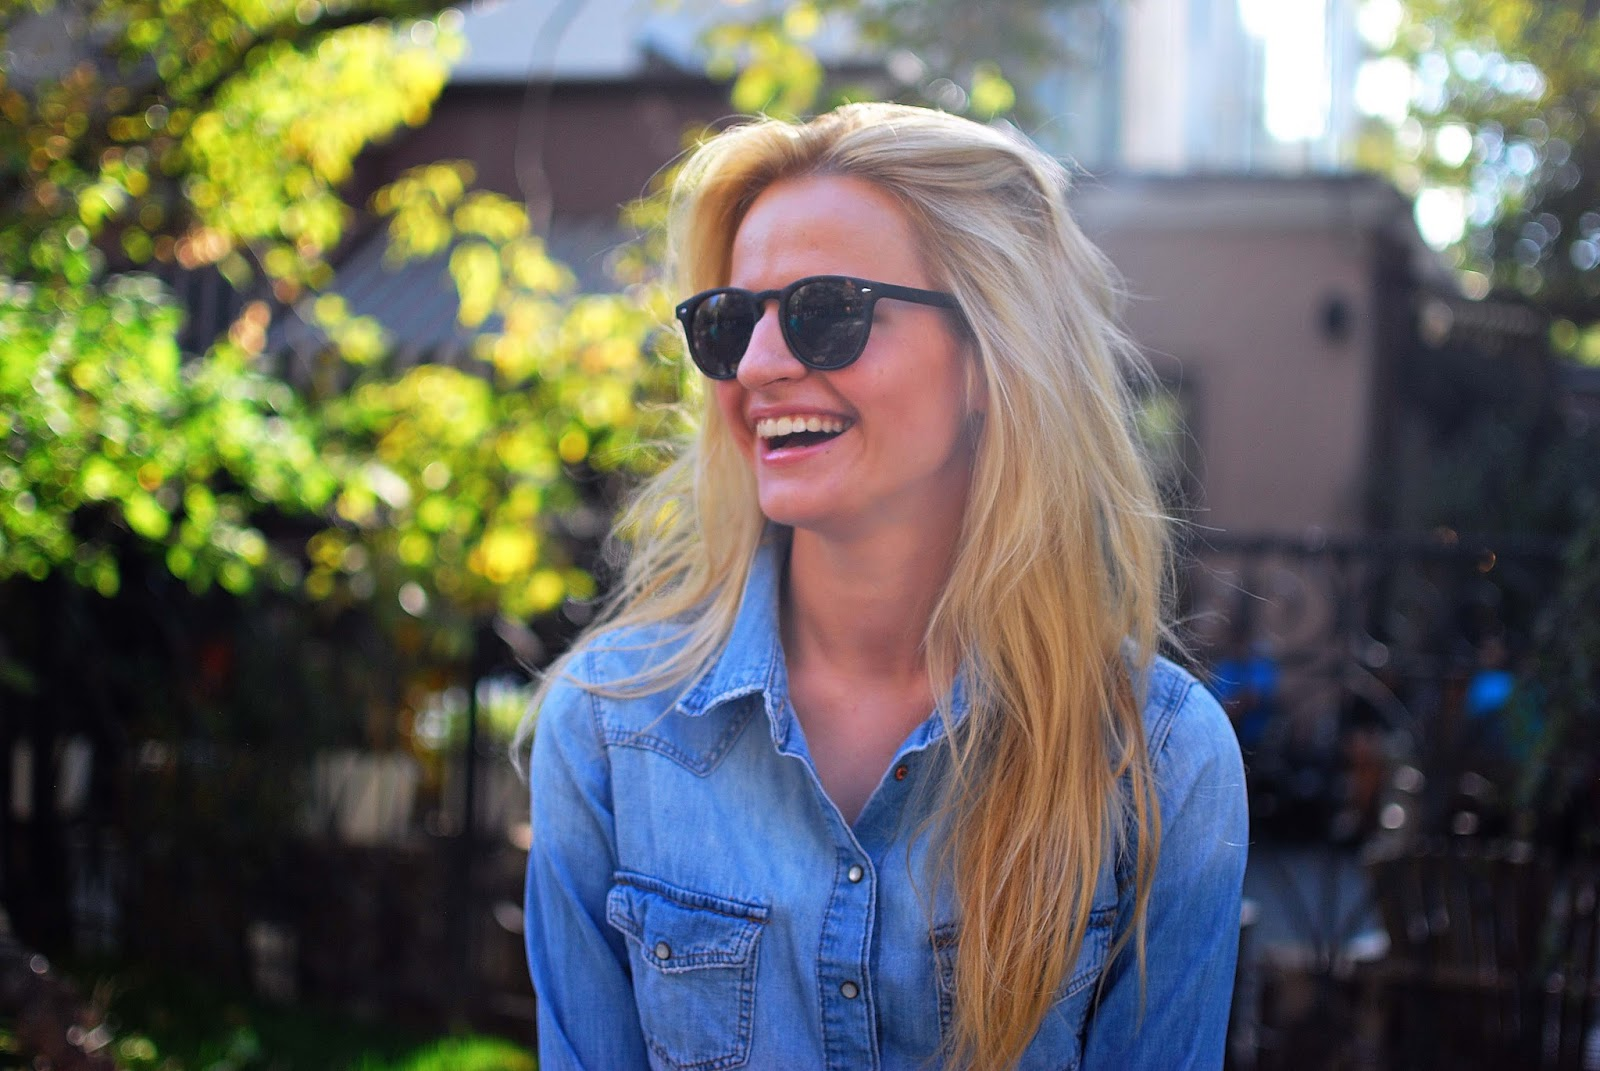 autumn portrait, autumn fashion photo, круглые очки для девушек